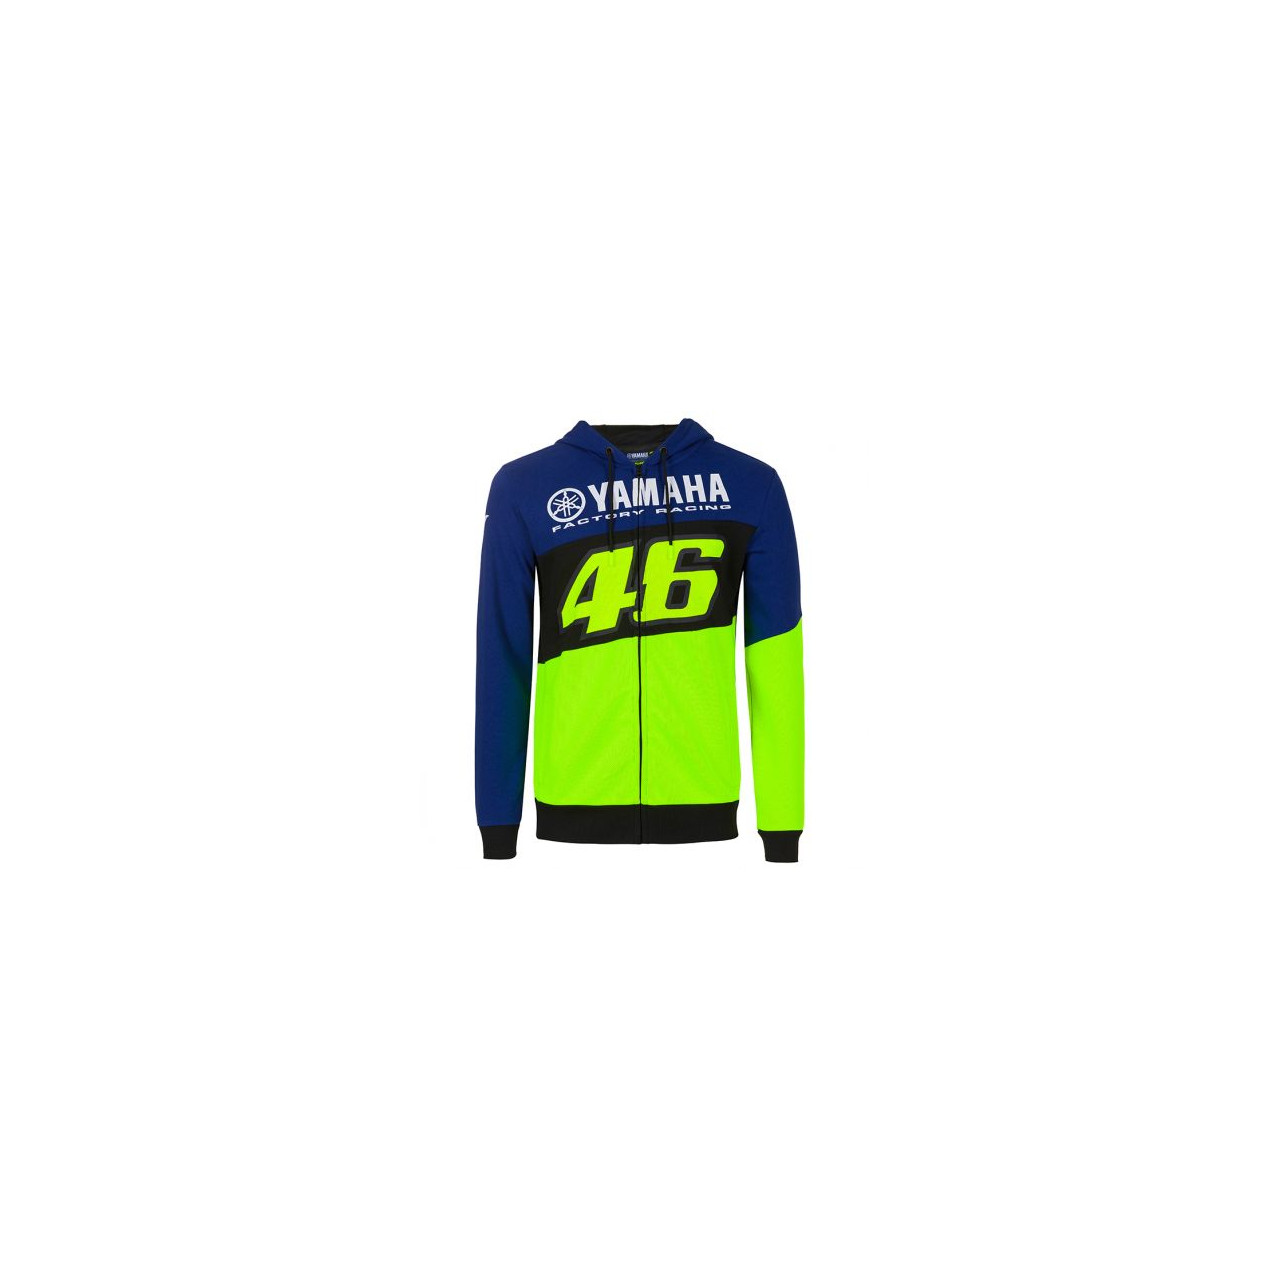 YAMAHA Sweat homme Racing VR46 2020